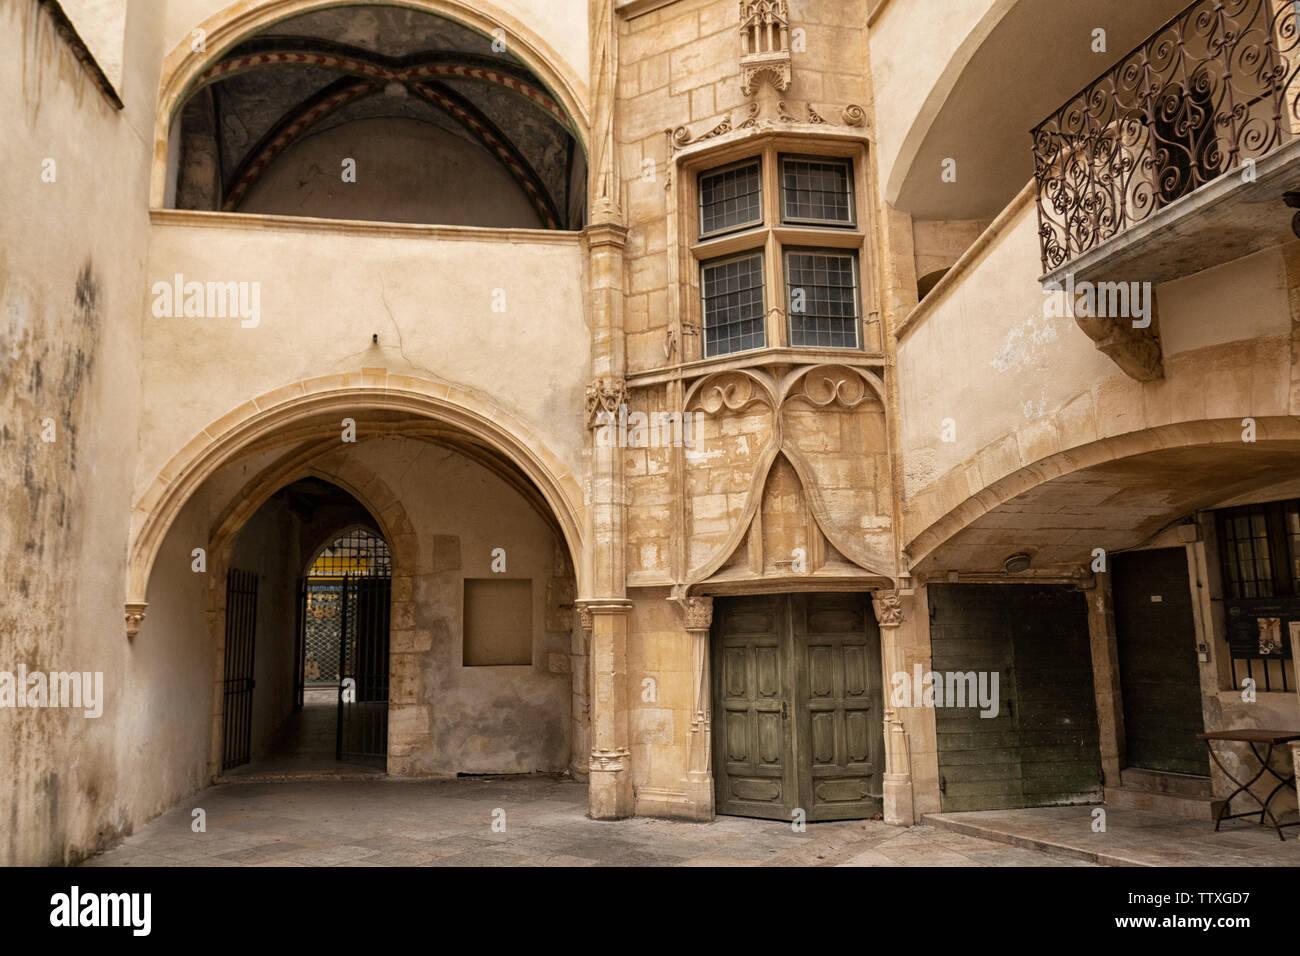 Traboule, courtyard in old City Center, Vieux Lyon, UNESCO World Heritage Lyon, - Stock Image